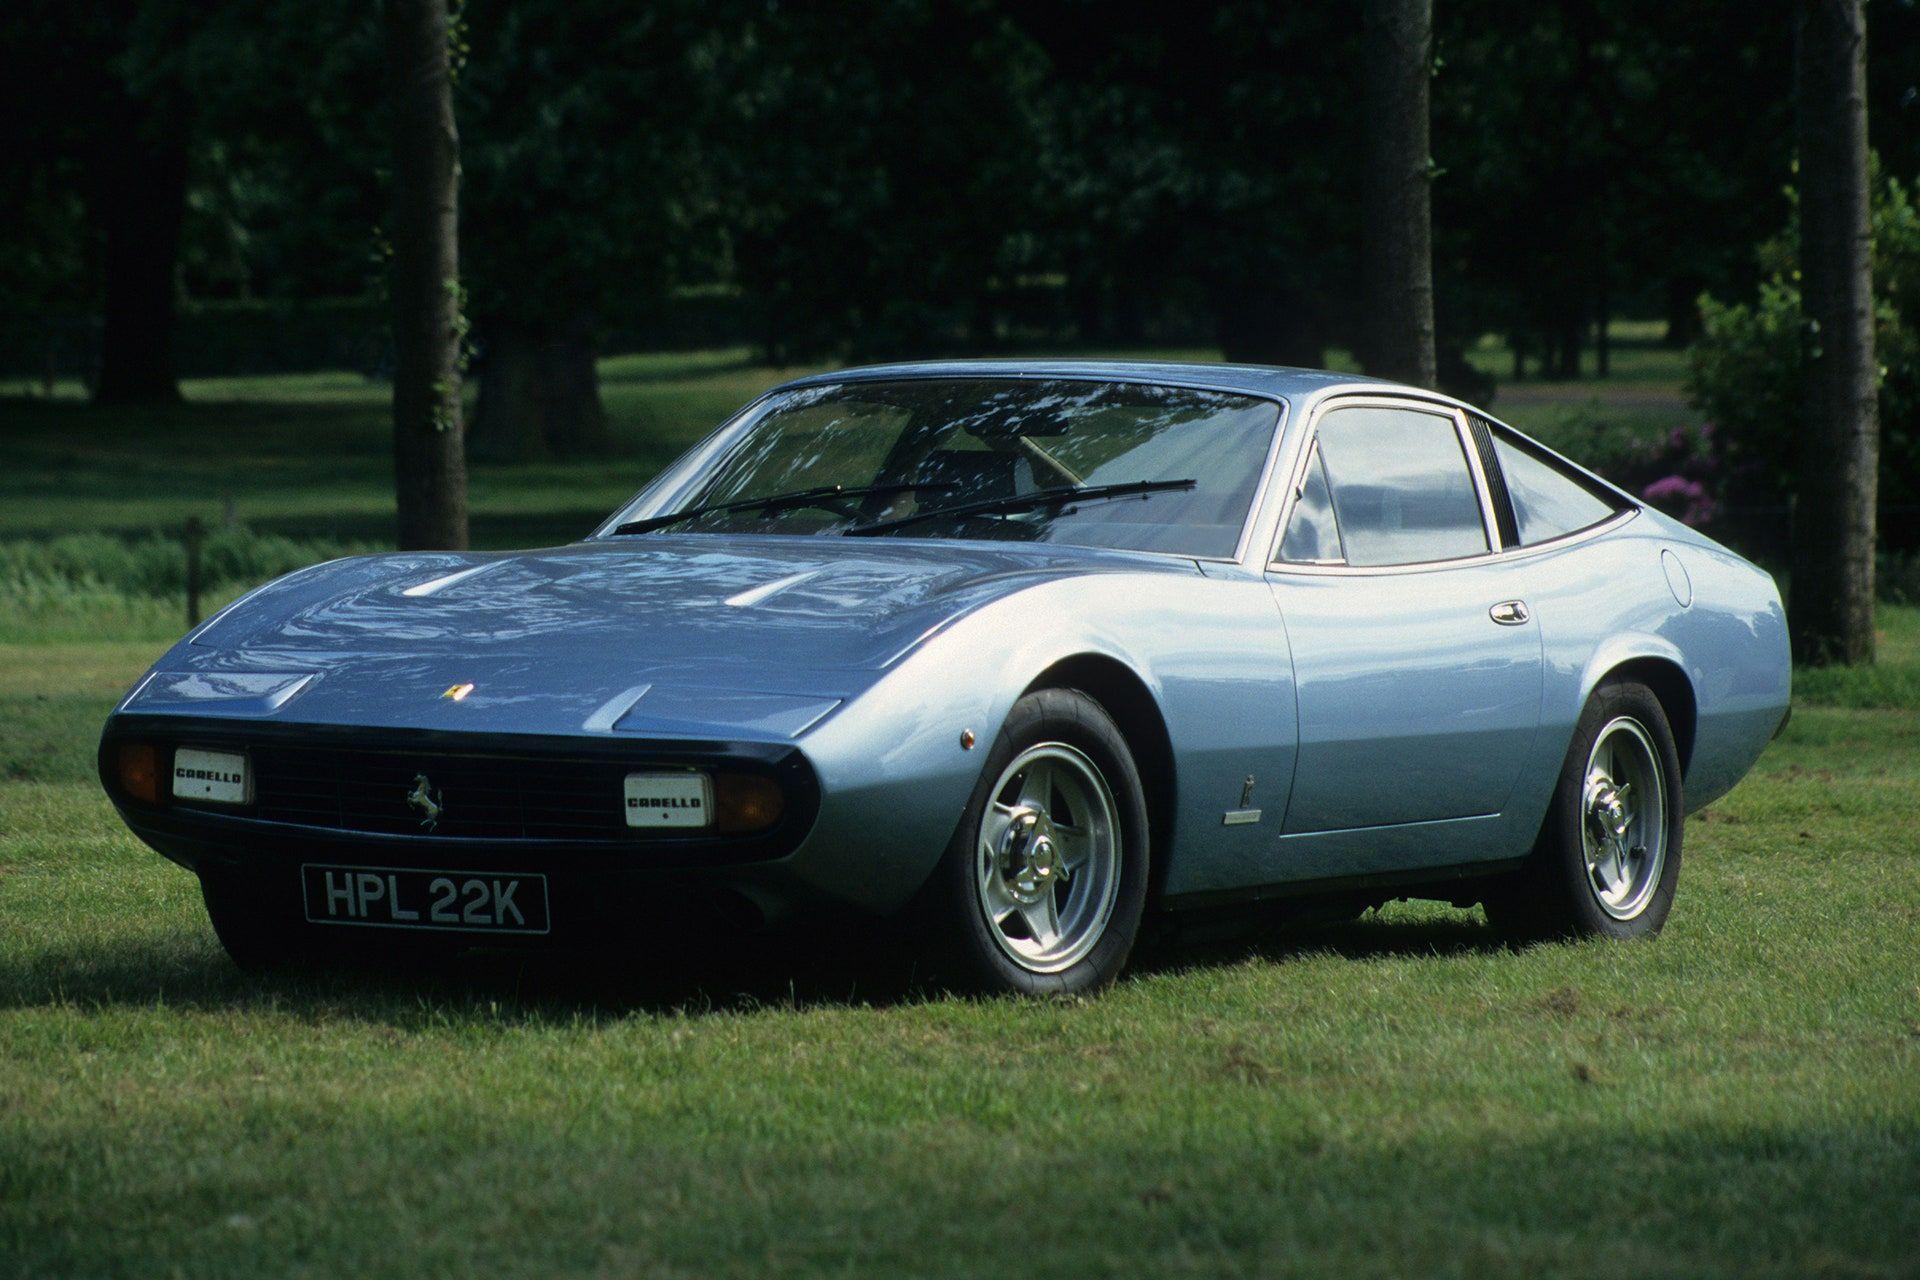 "<img src=""ferrari-365-gtc.jpg"" alt=""A beautiful Ferrari 365 GTC"">"